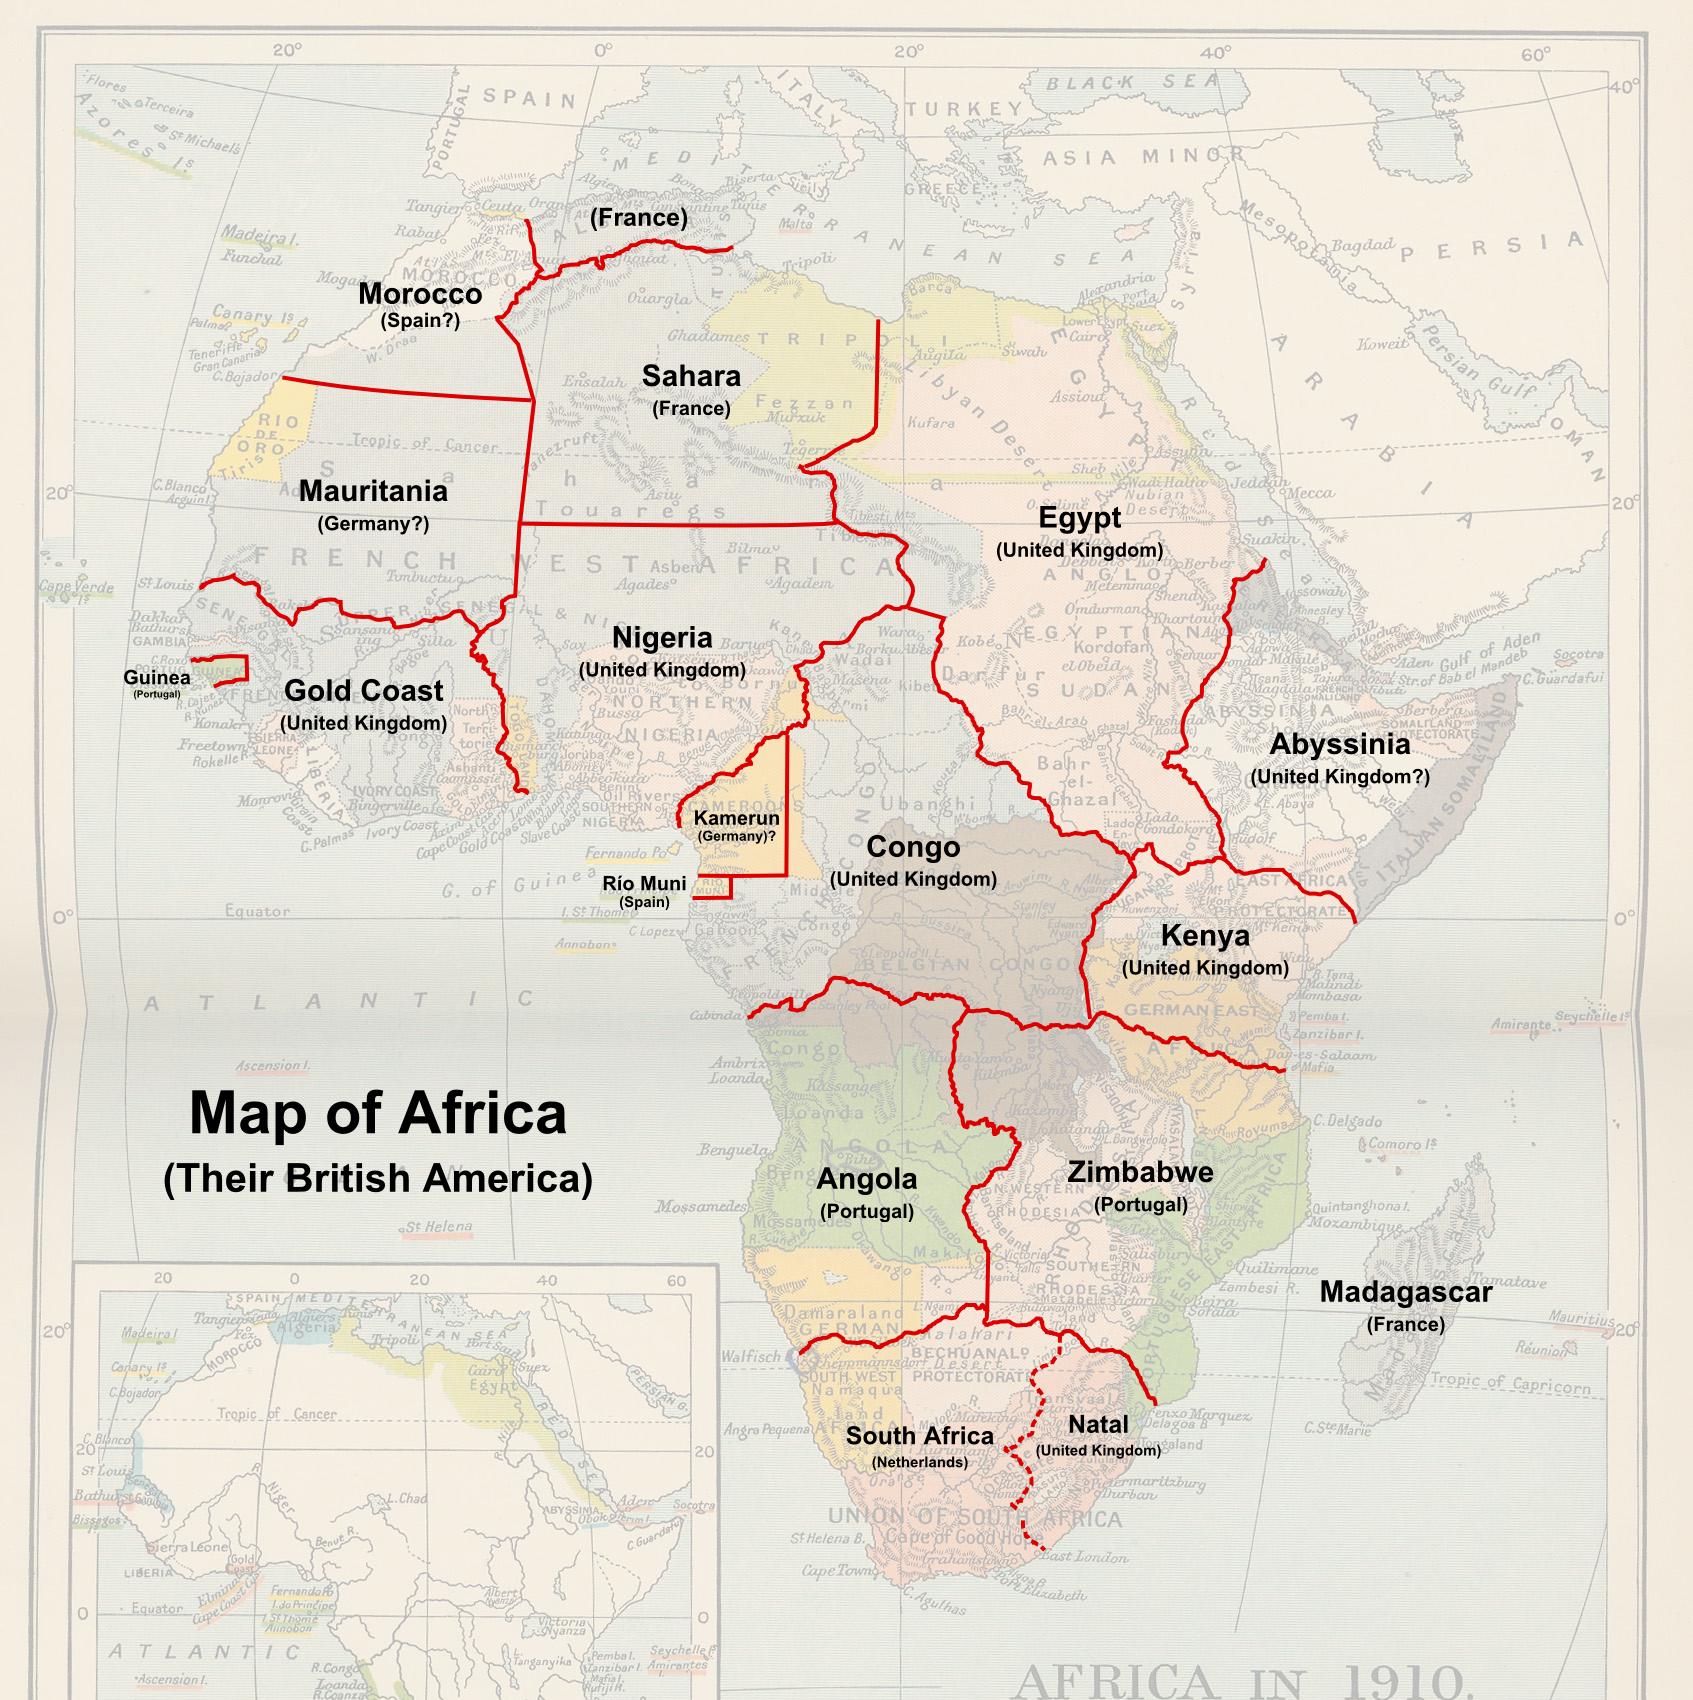 Maps (Their British America) | Alternative History | FANDOM